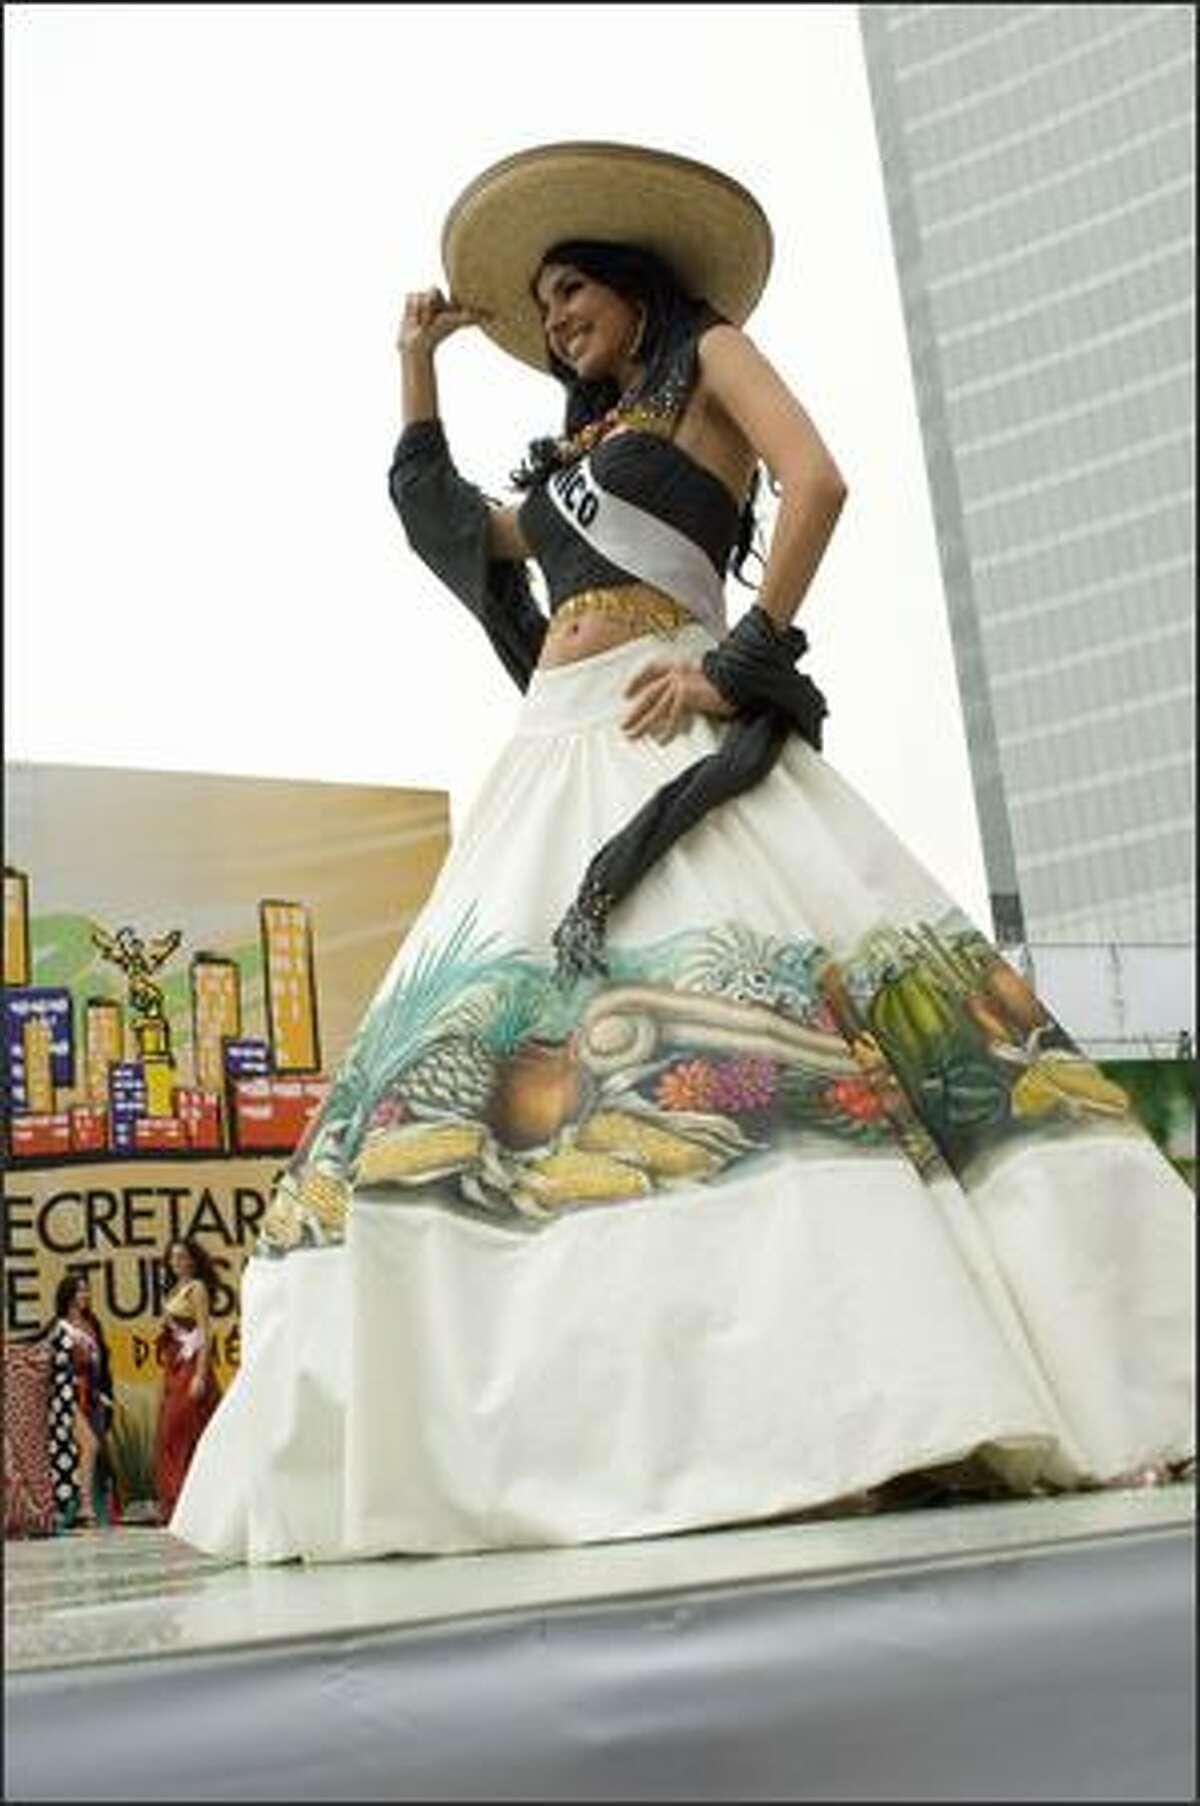 Rosa Maria Ojeda Cuen, Miss Mexico 2007, displays her national costume.